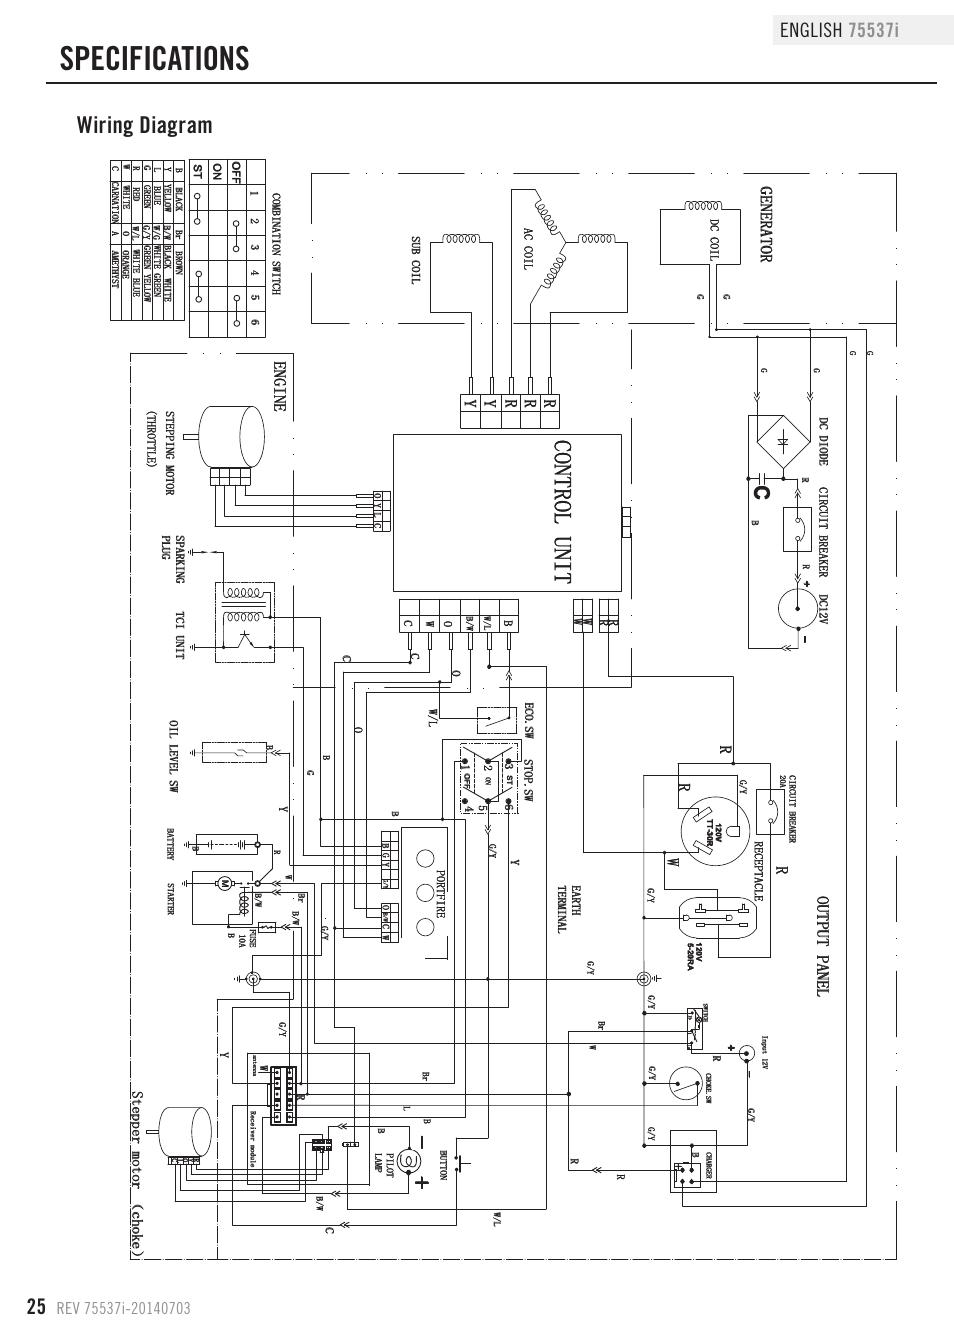 [DIAGRAM] Simplicity Champion Wiring Diagram FULL Version